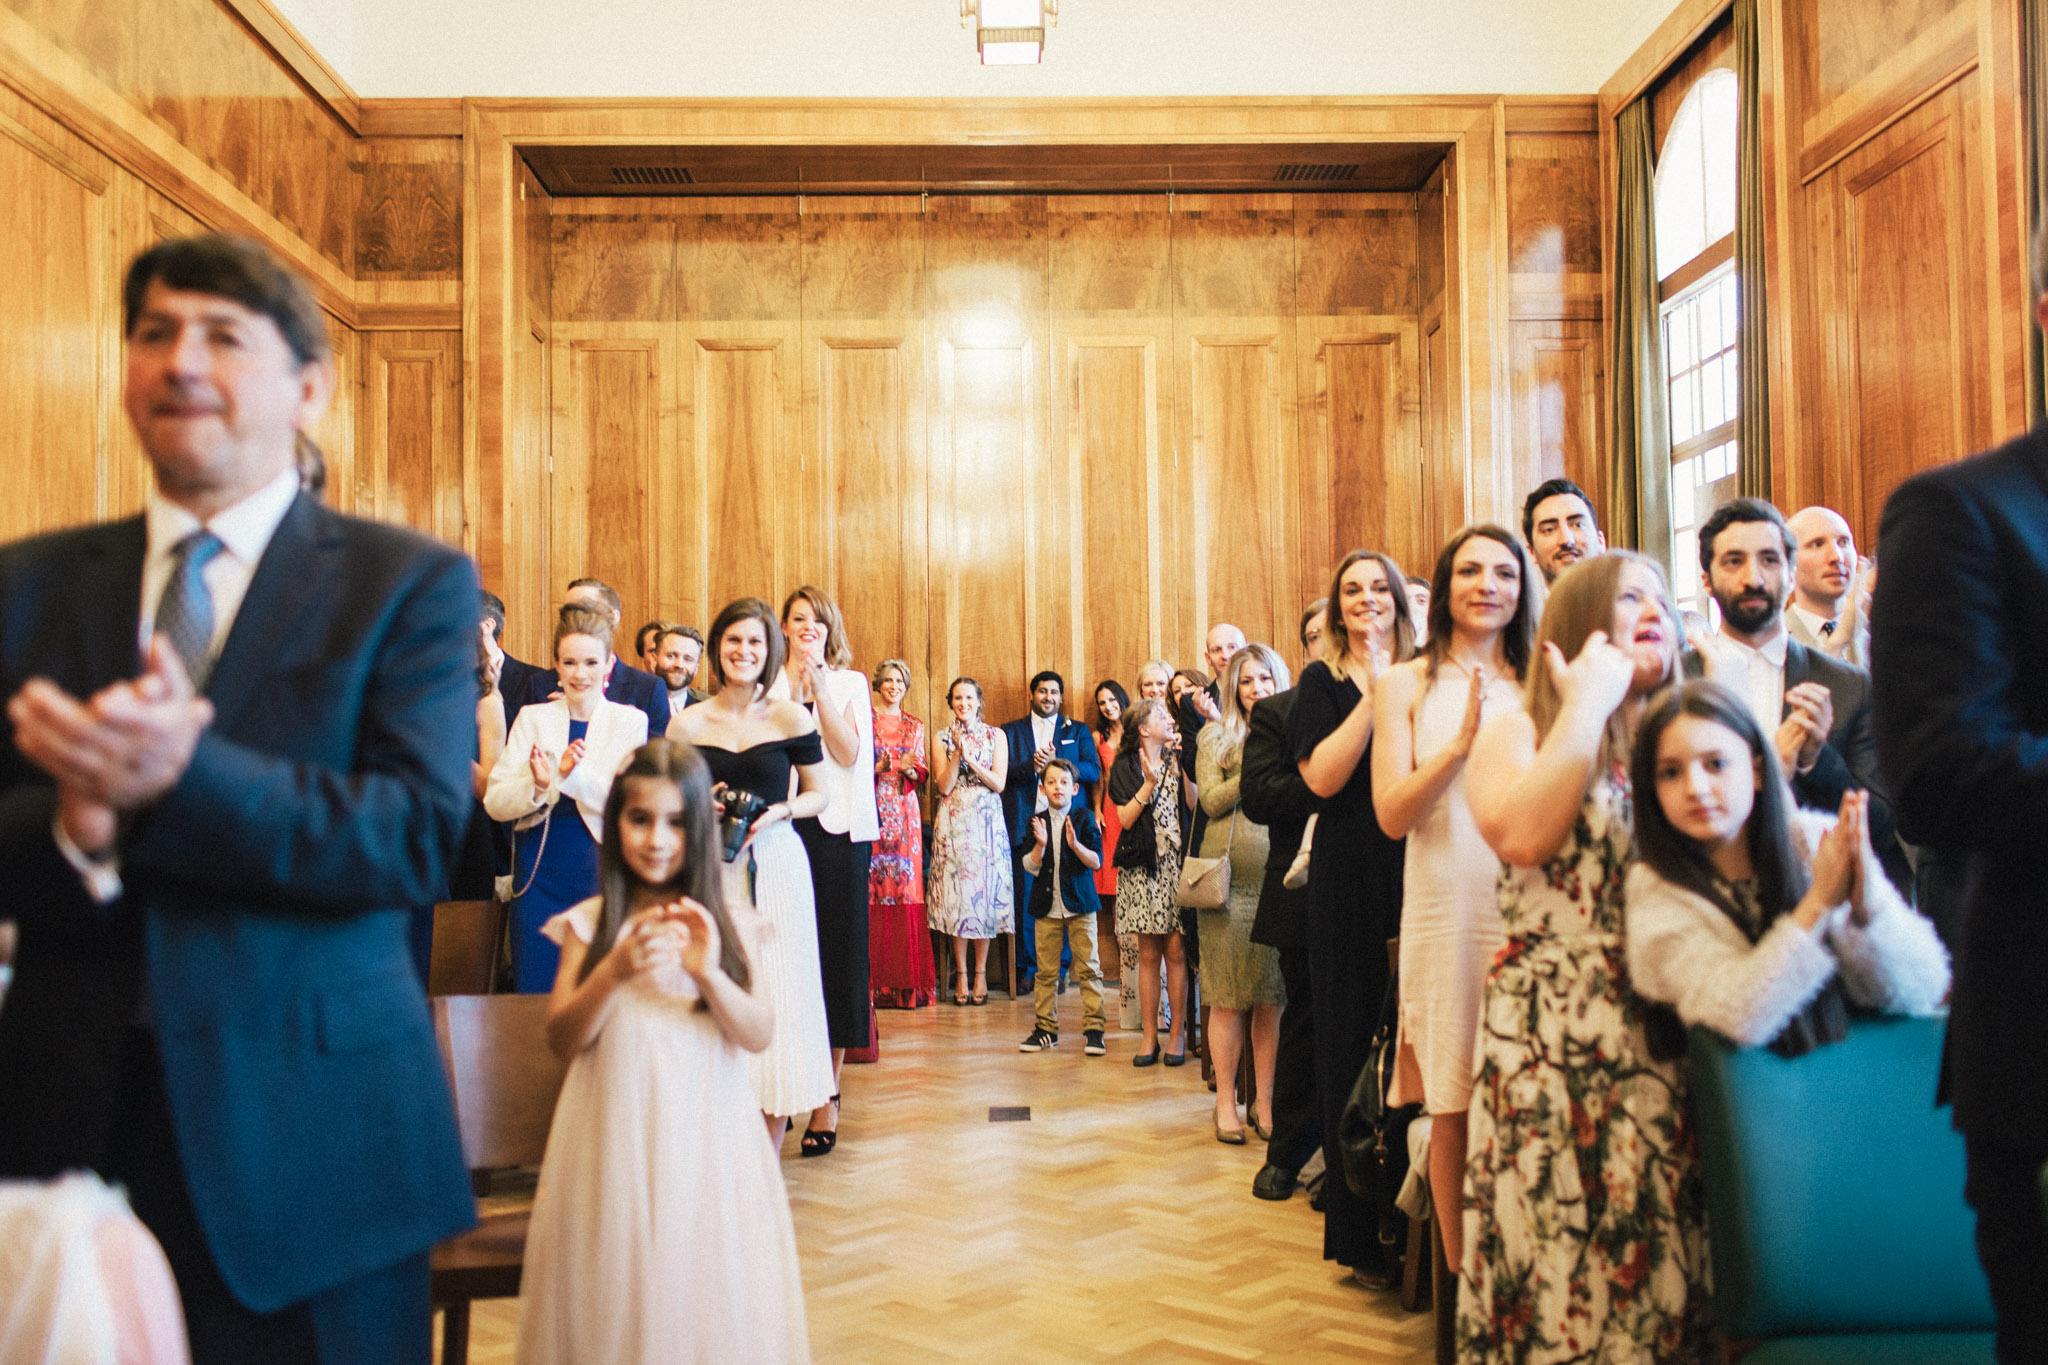 trinity_buoy_wharf_hackney_town_hall_wedding_376.jpg